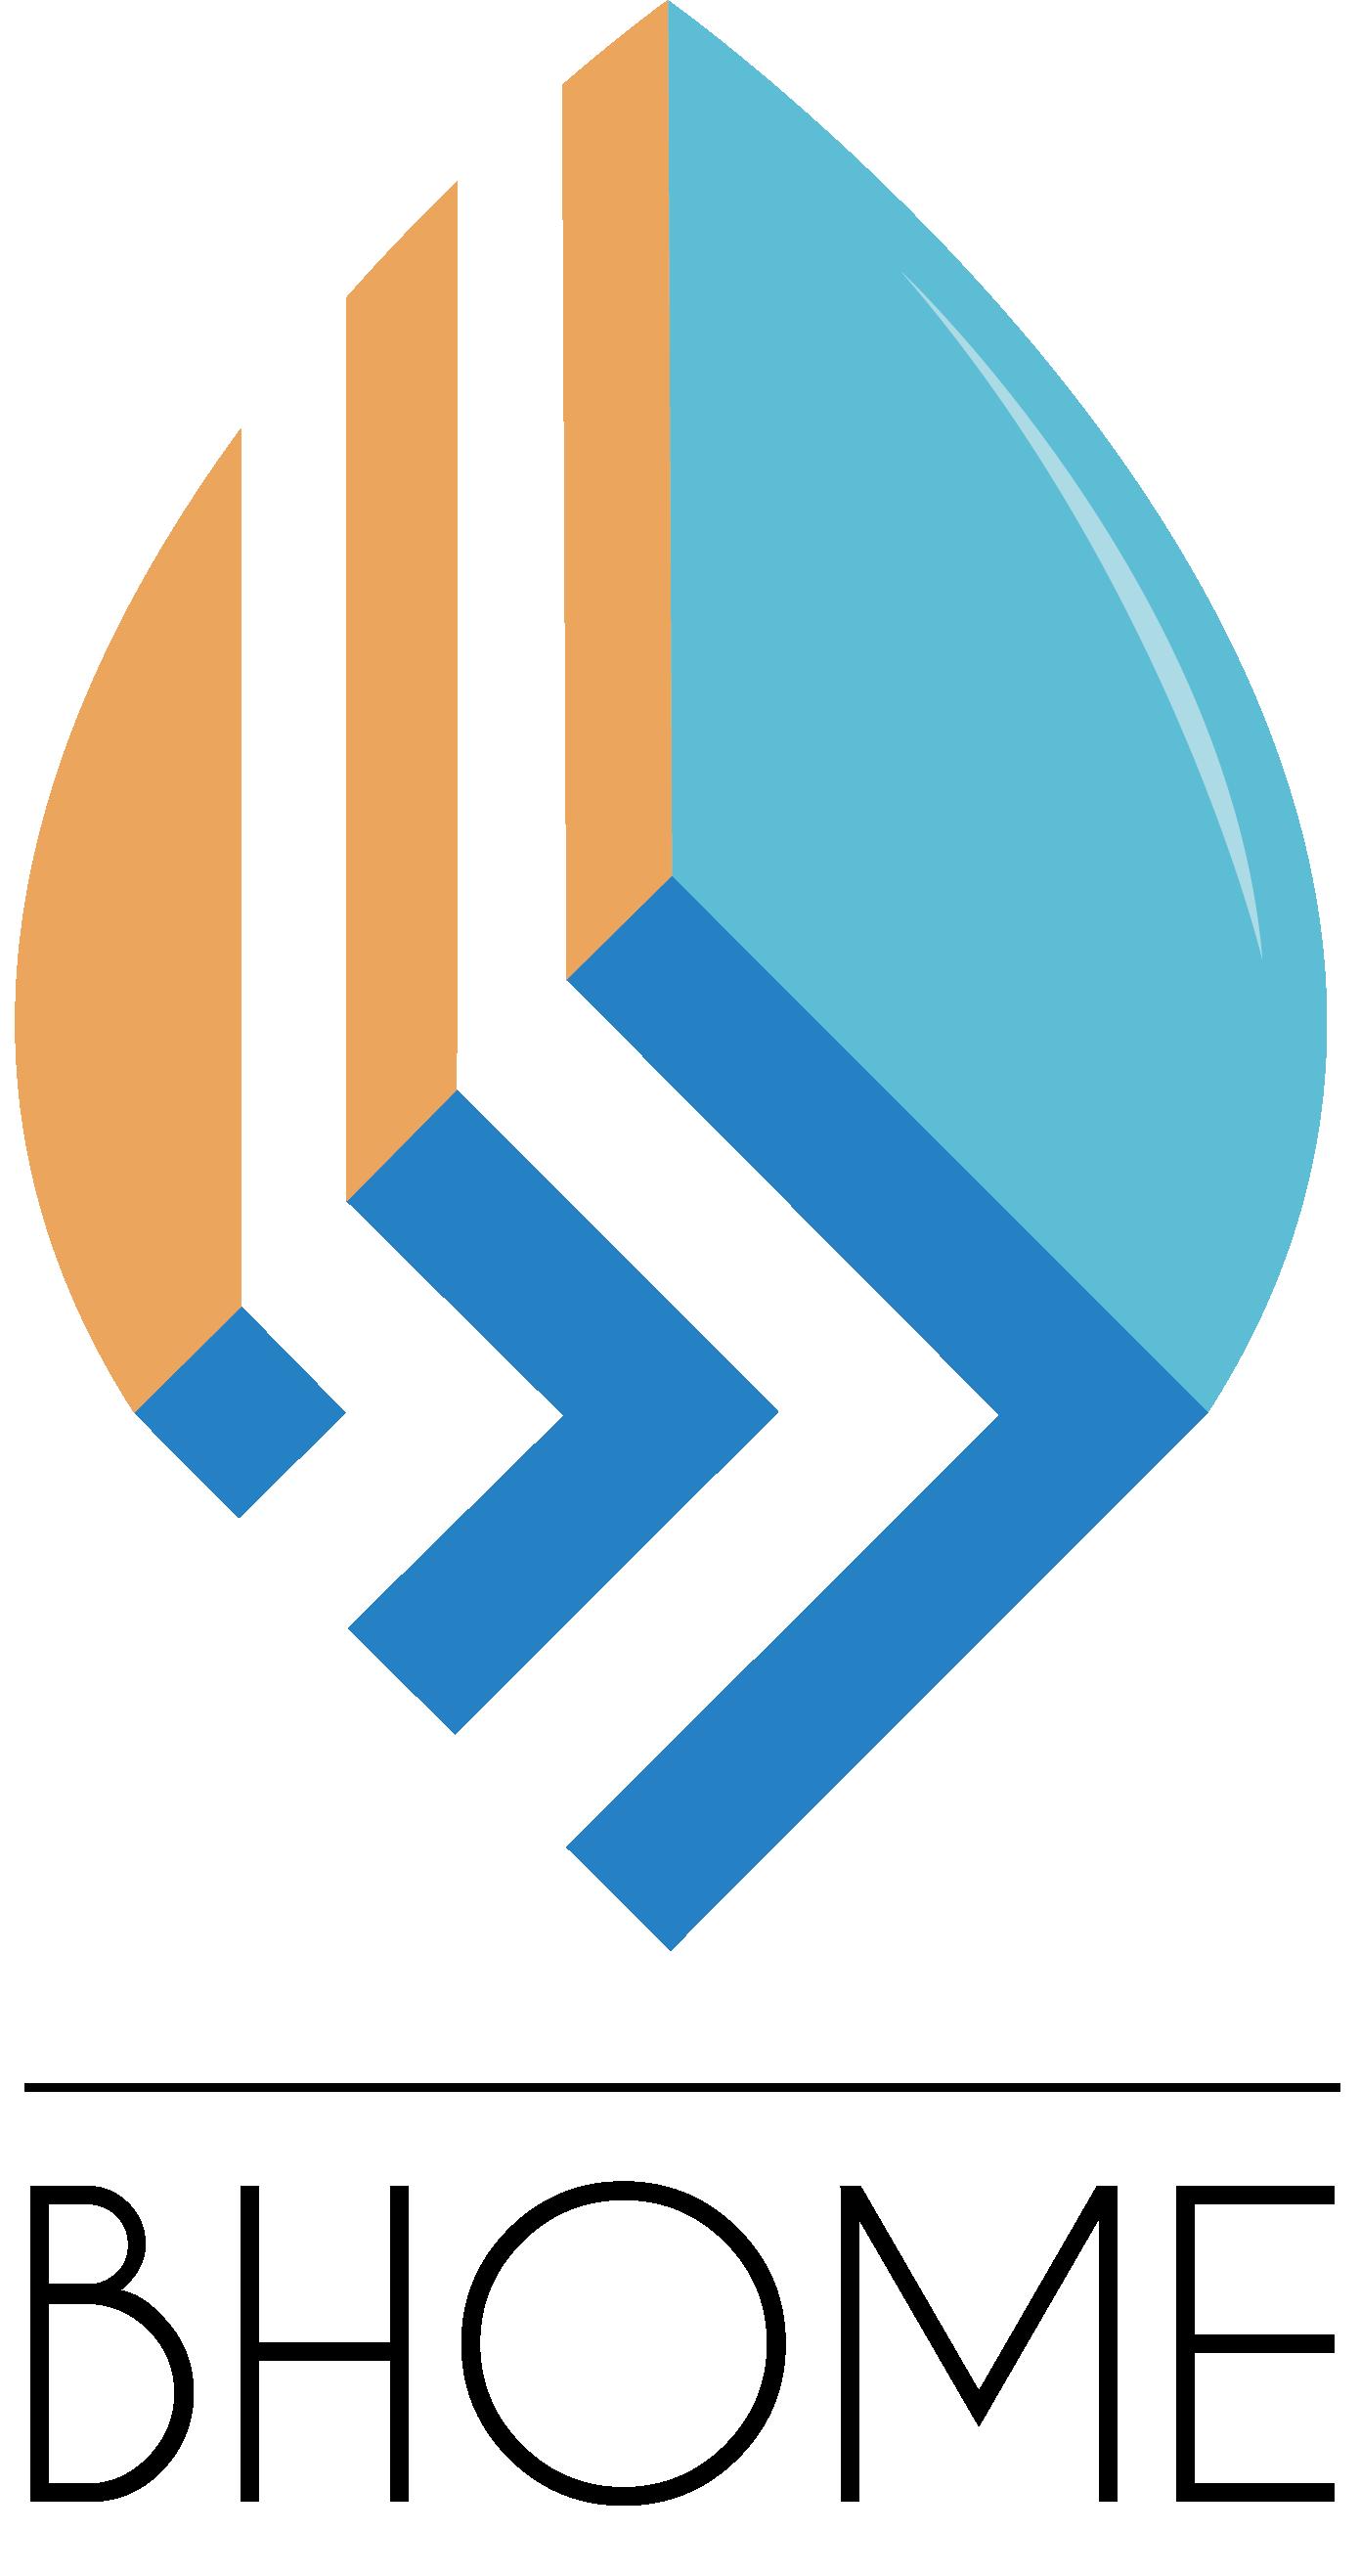 Bhome logo kopie.png